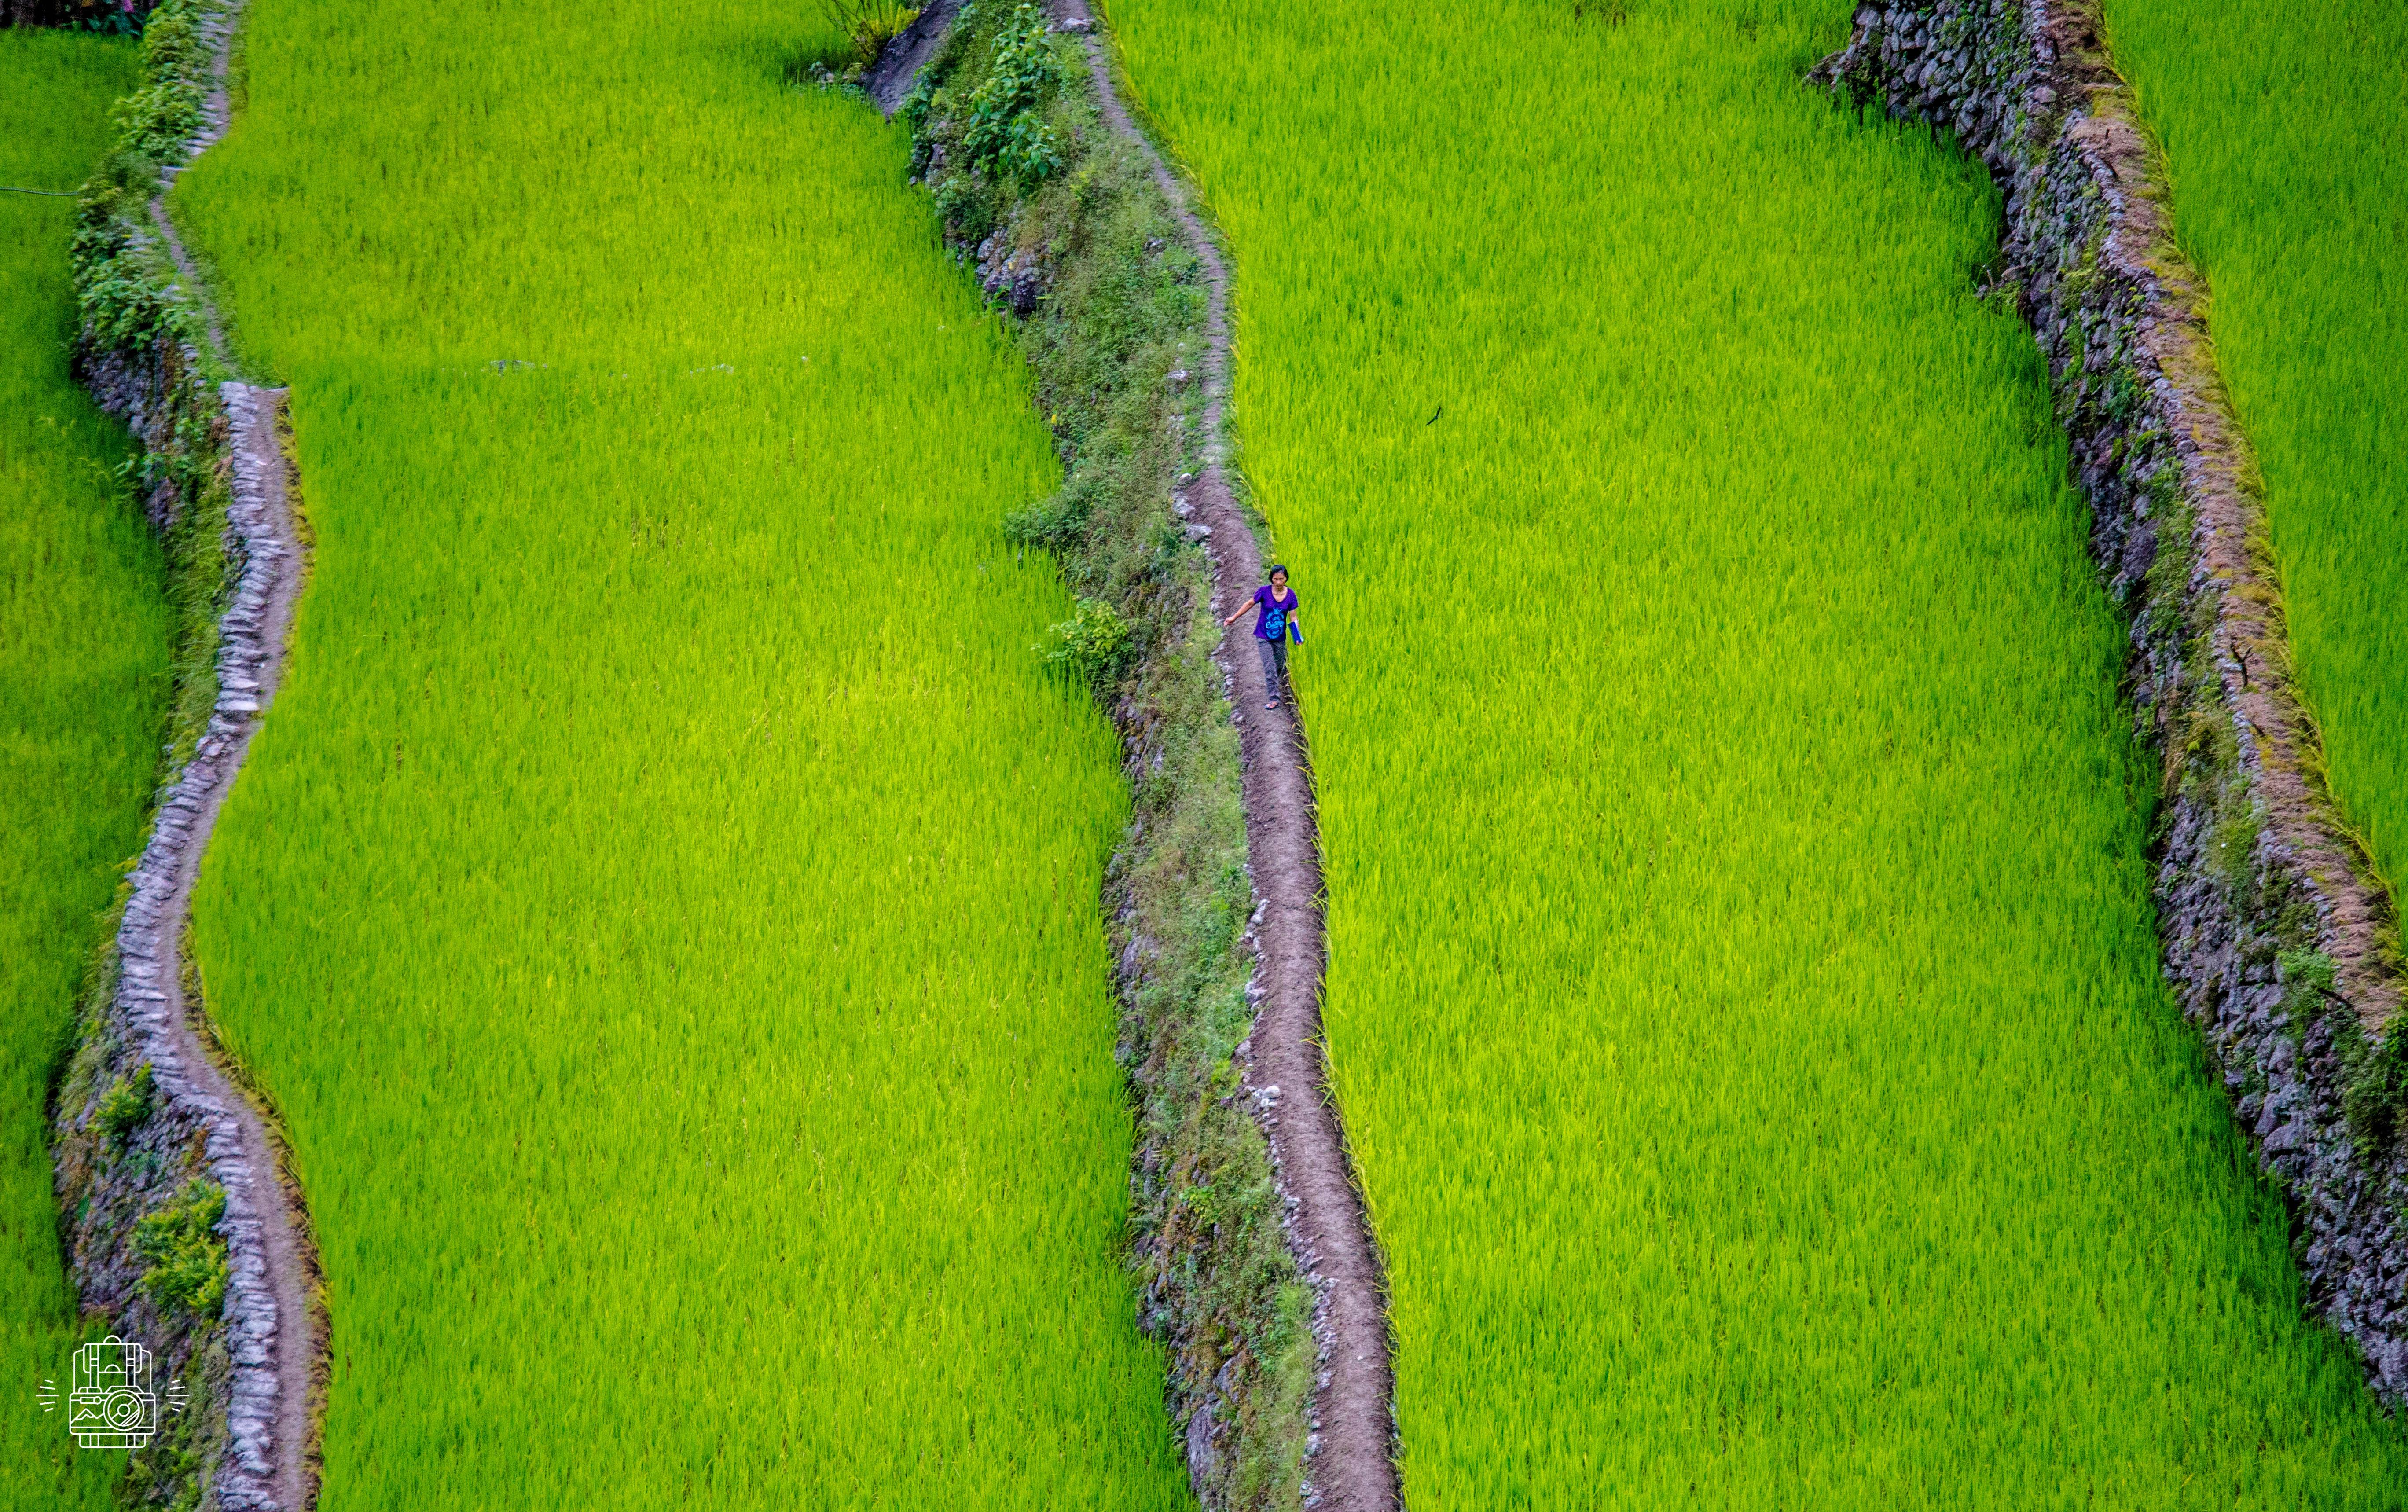 Philippines/Banaue